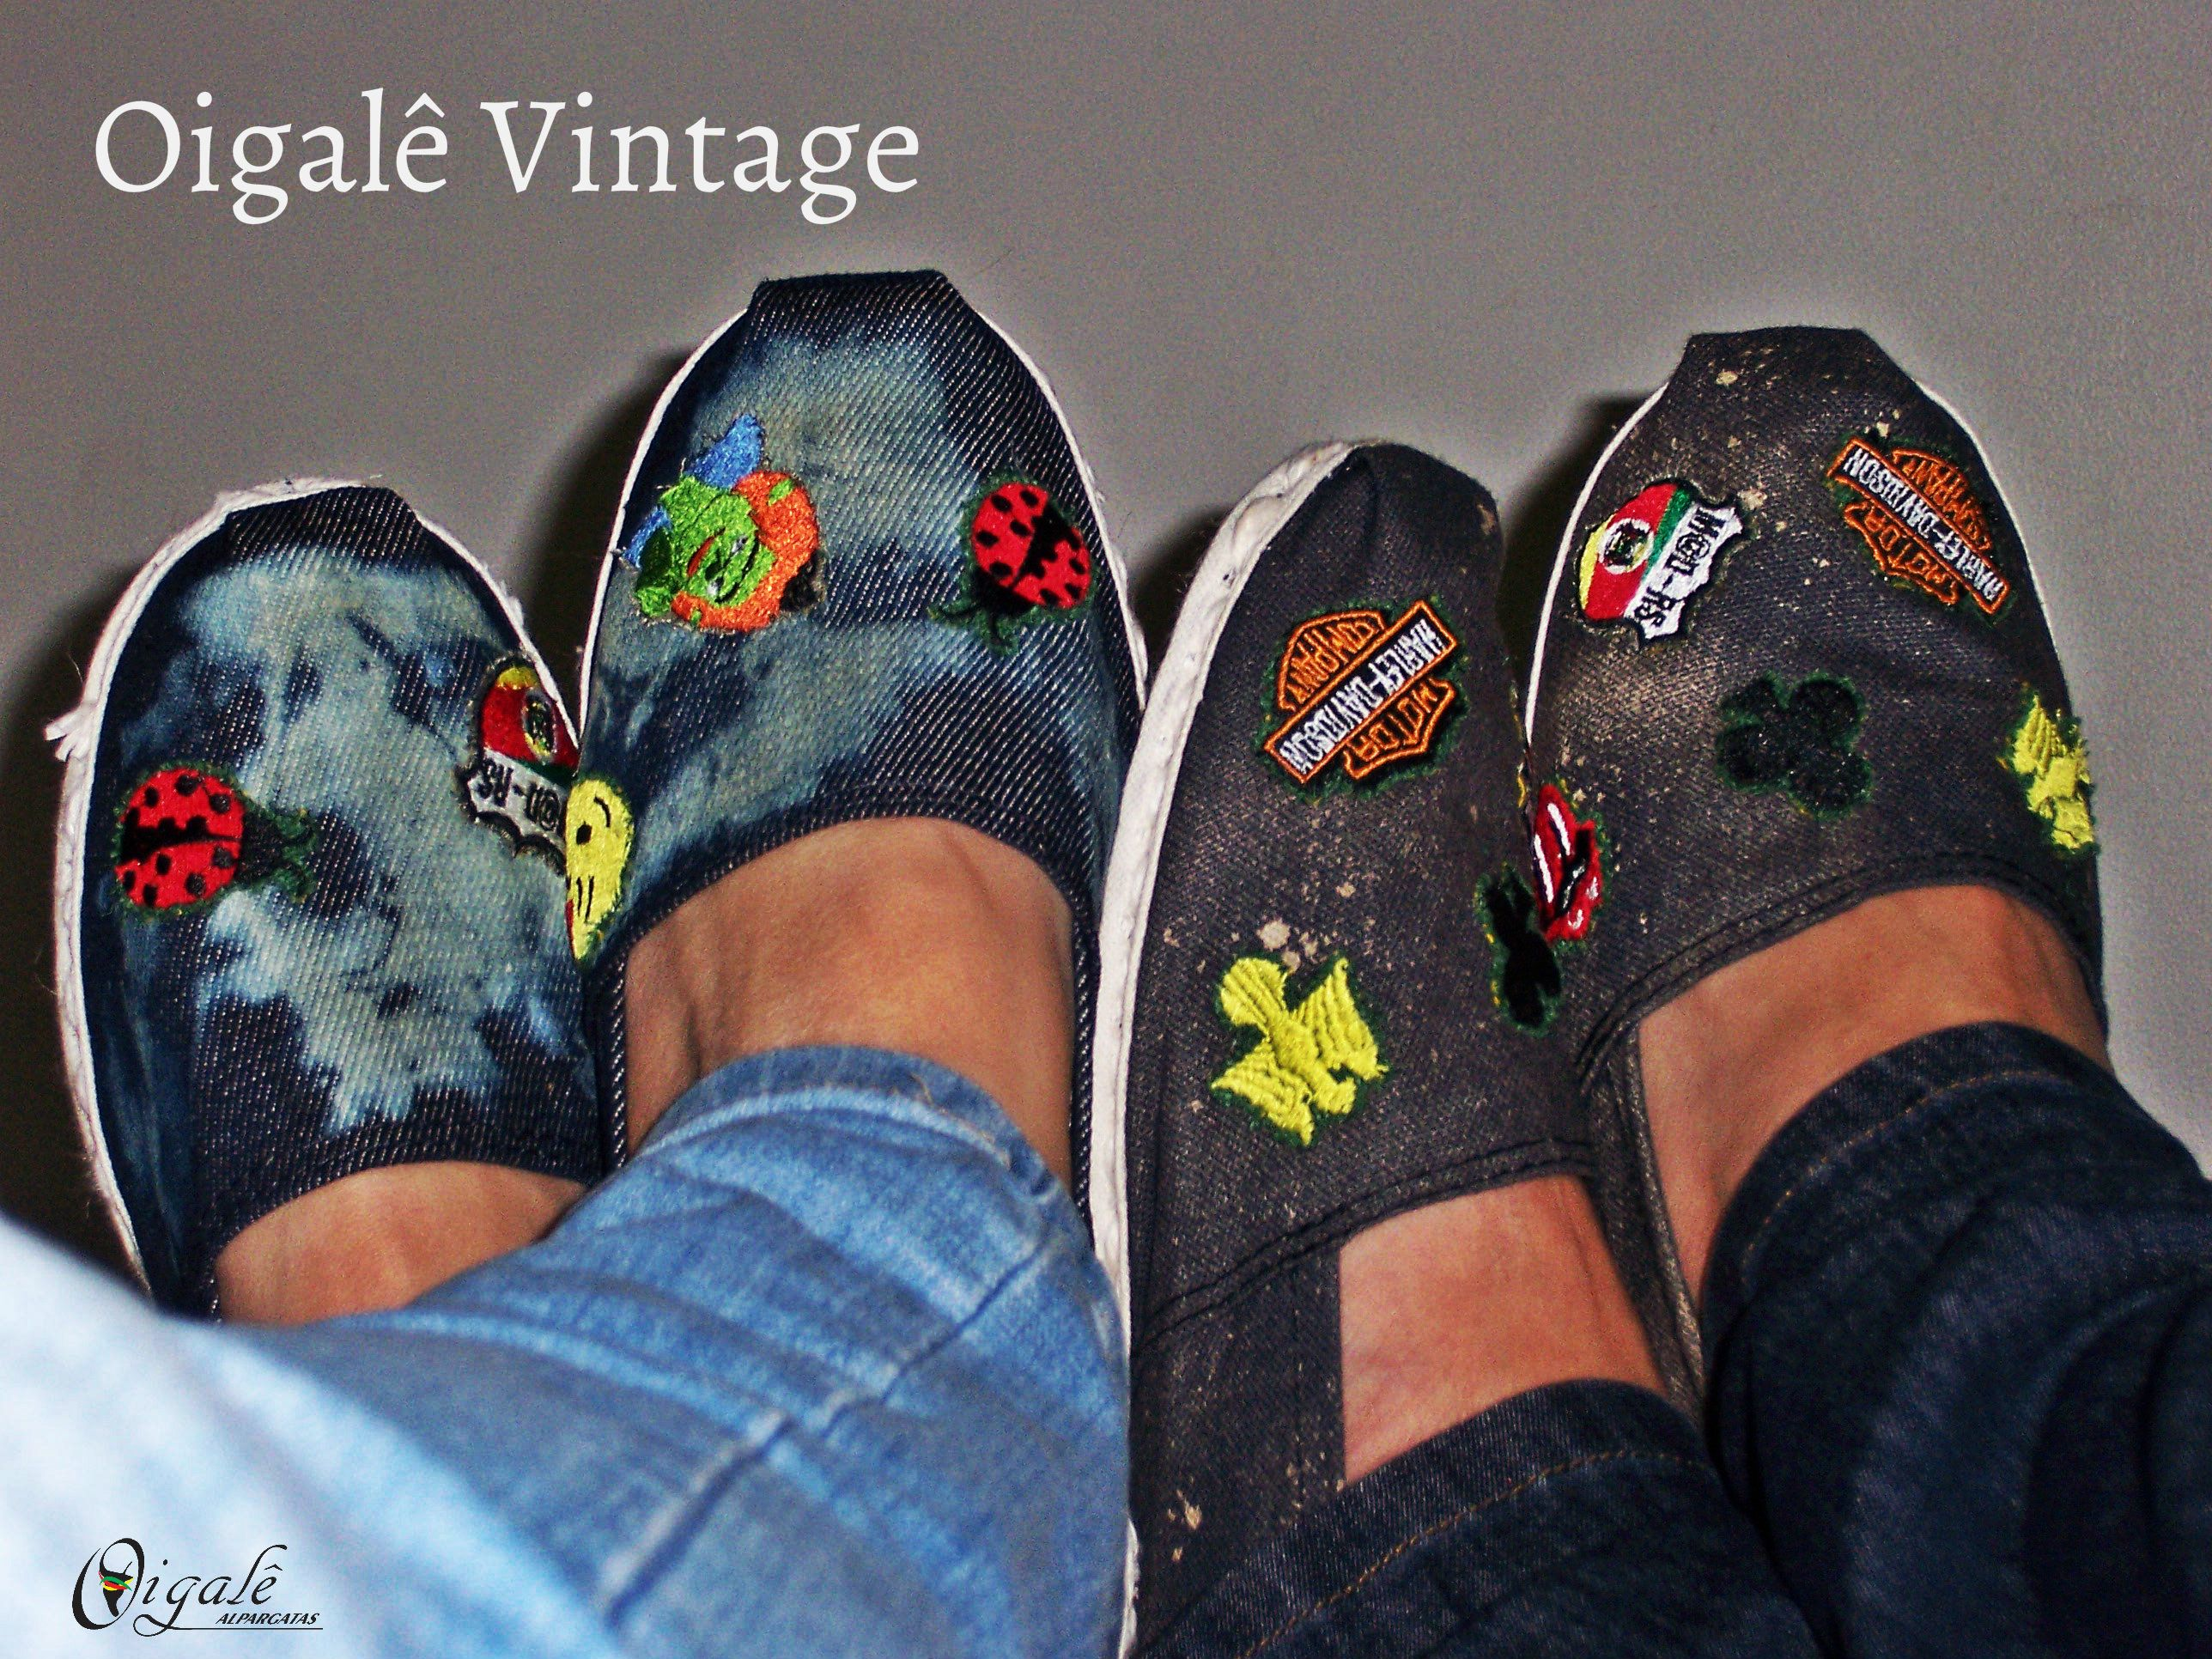 Alpargatas bordadas de forma artesanal!!! Bjos coloridos e brilhantes